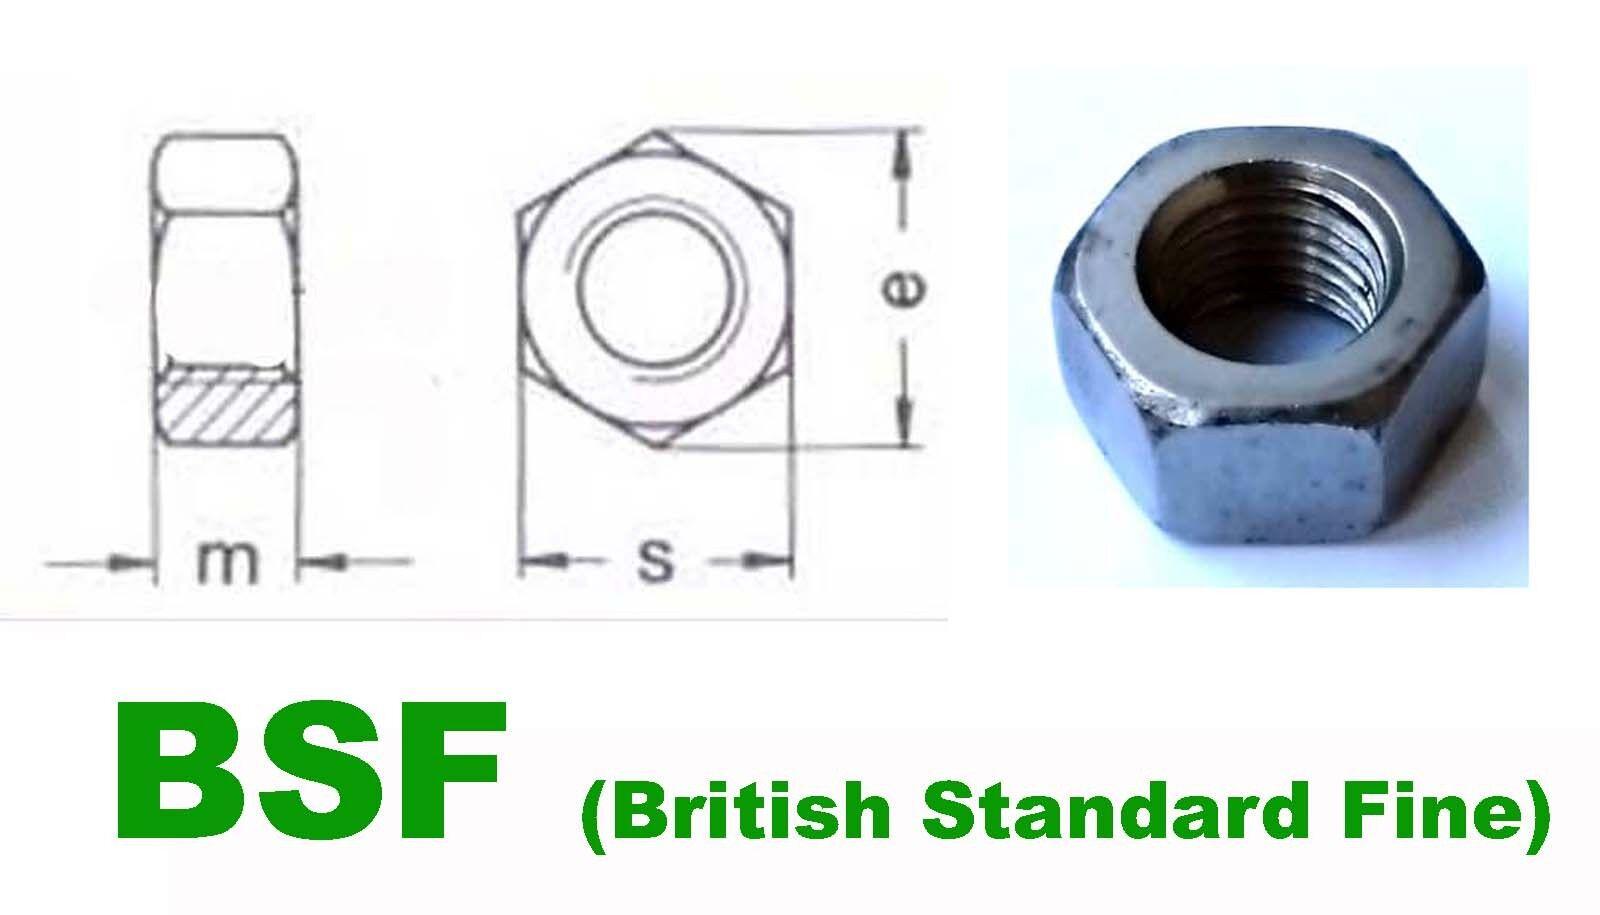 5/8 BSF Full Nuts - Classic/Vintage Thread British Standard Fine - Pack of x5